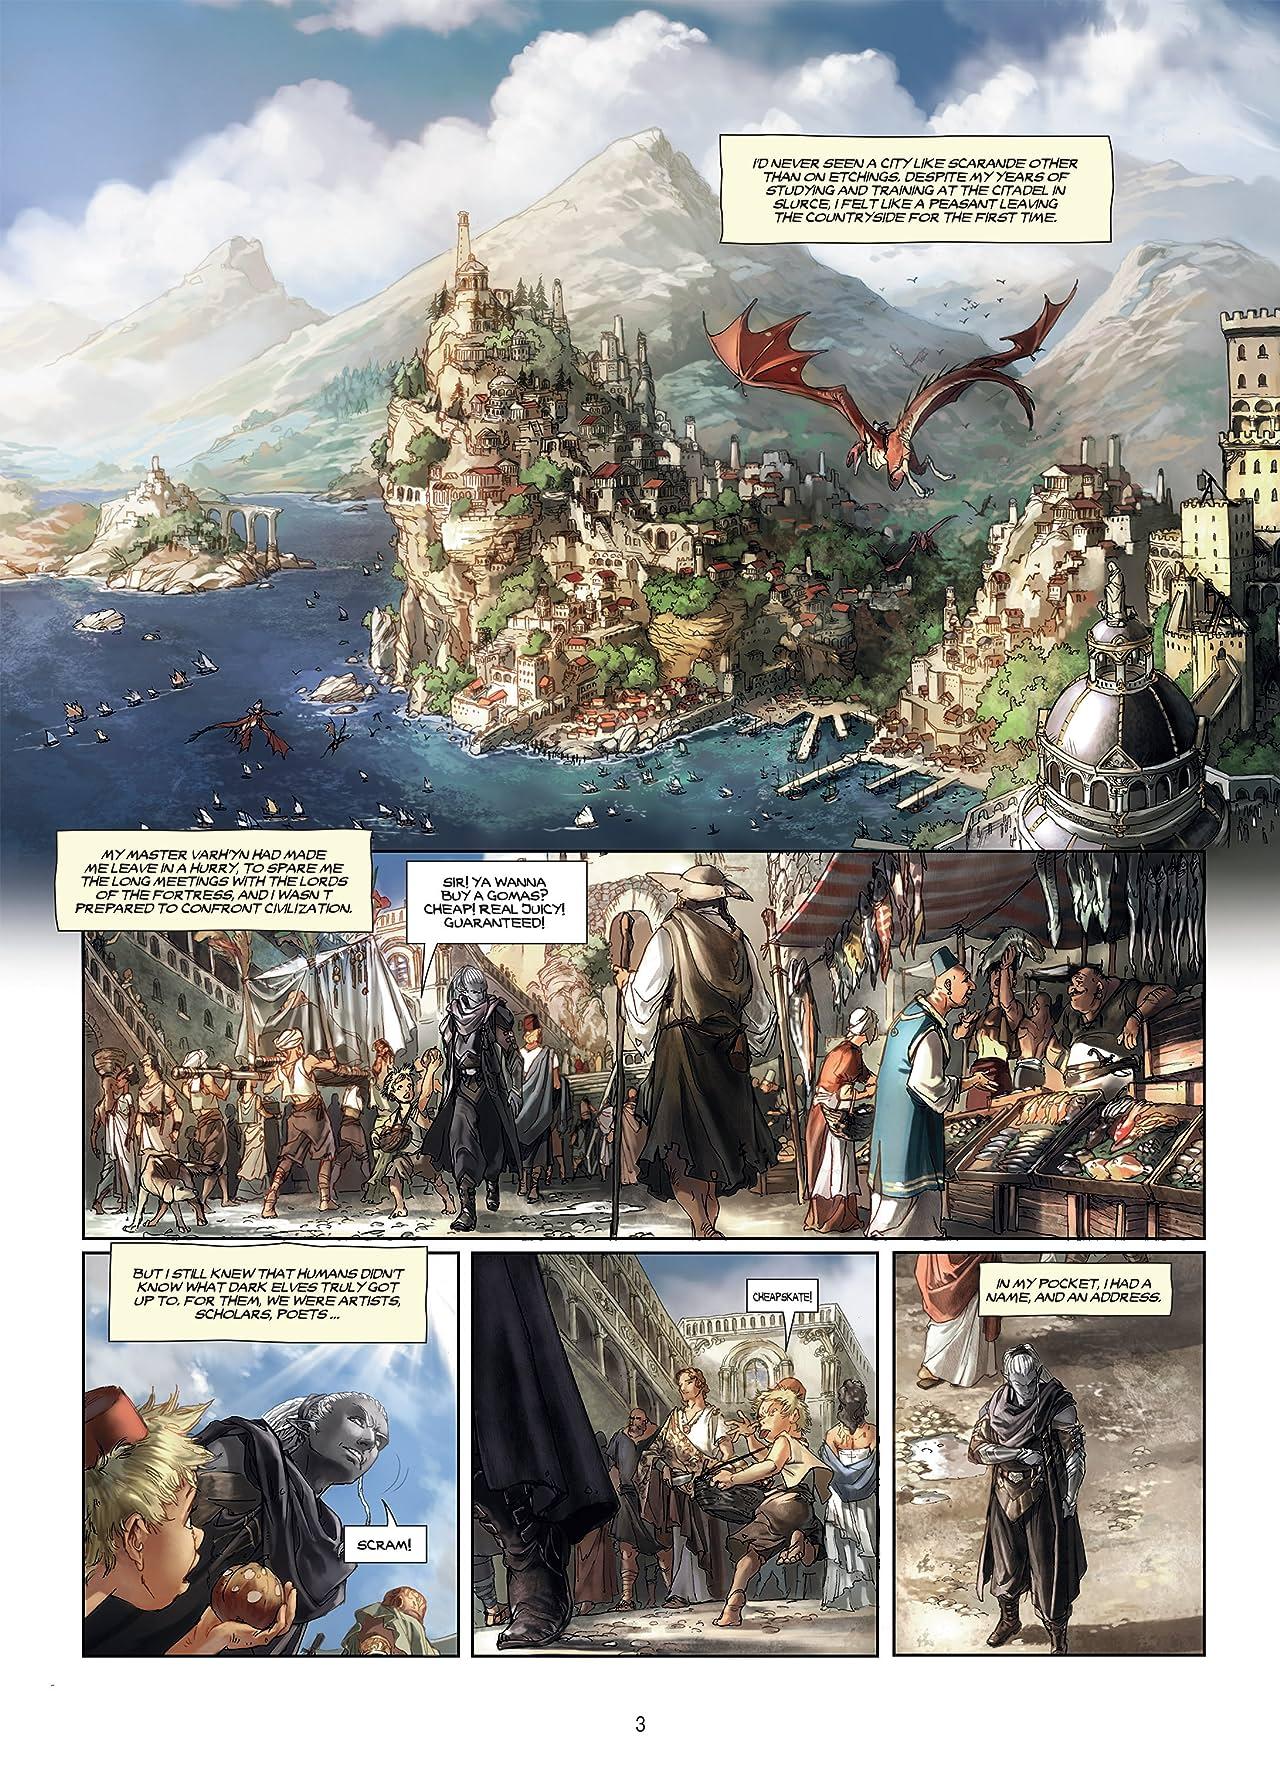 Elves Vol. 10: Dark Elf, Black Heart